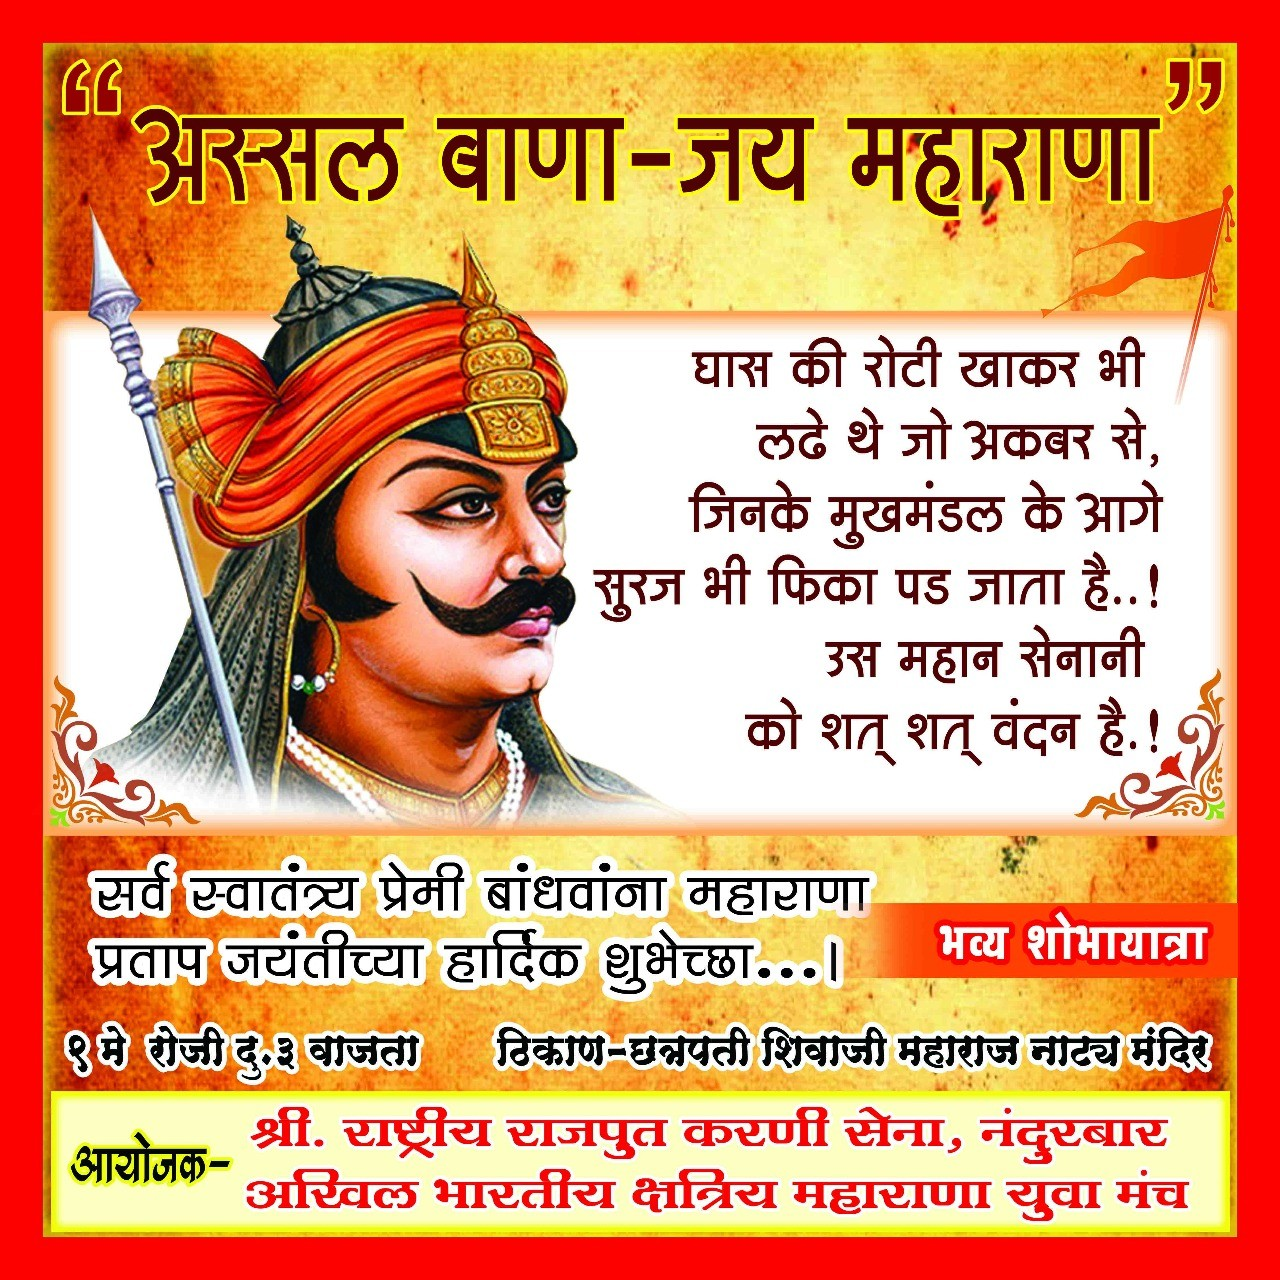 महाराणा प्रताप सिंह जयंती - ShareChat